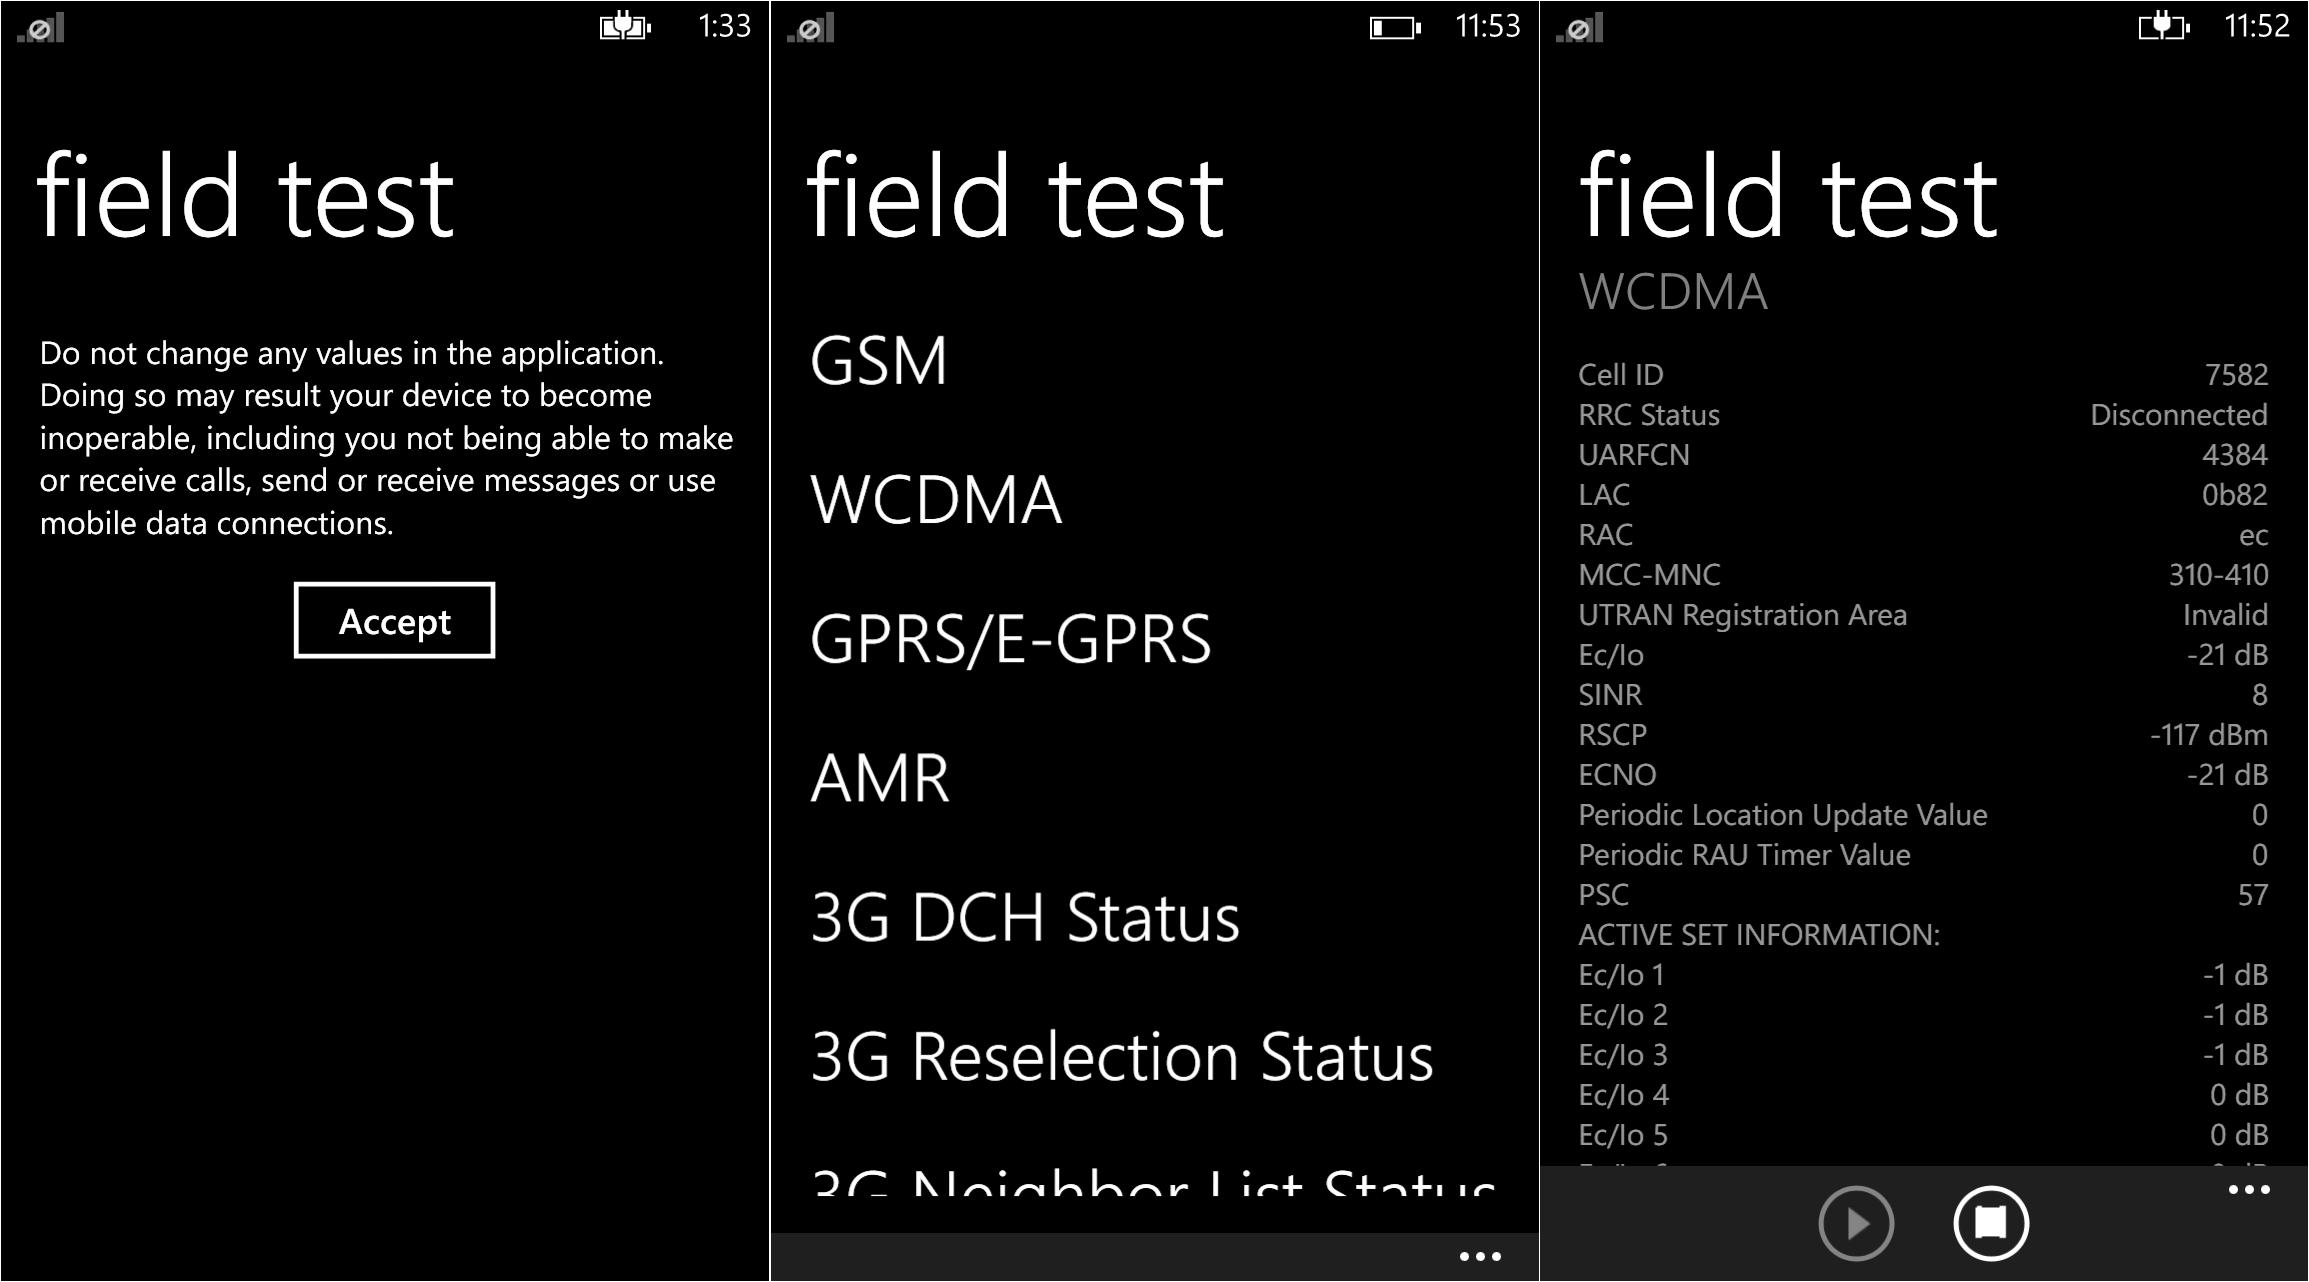 Windows Phone's Field Test app.